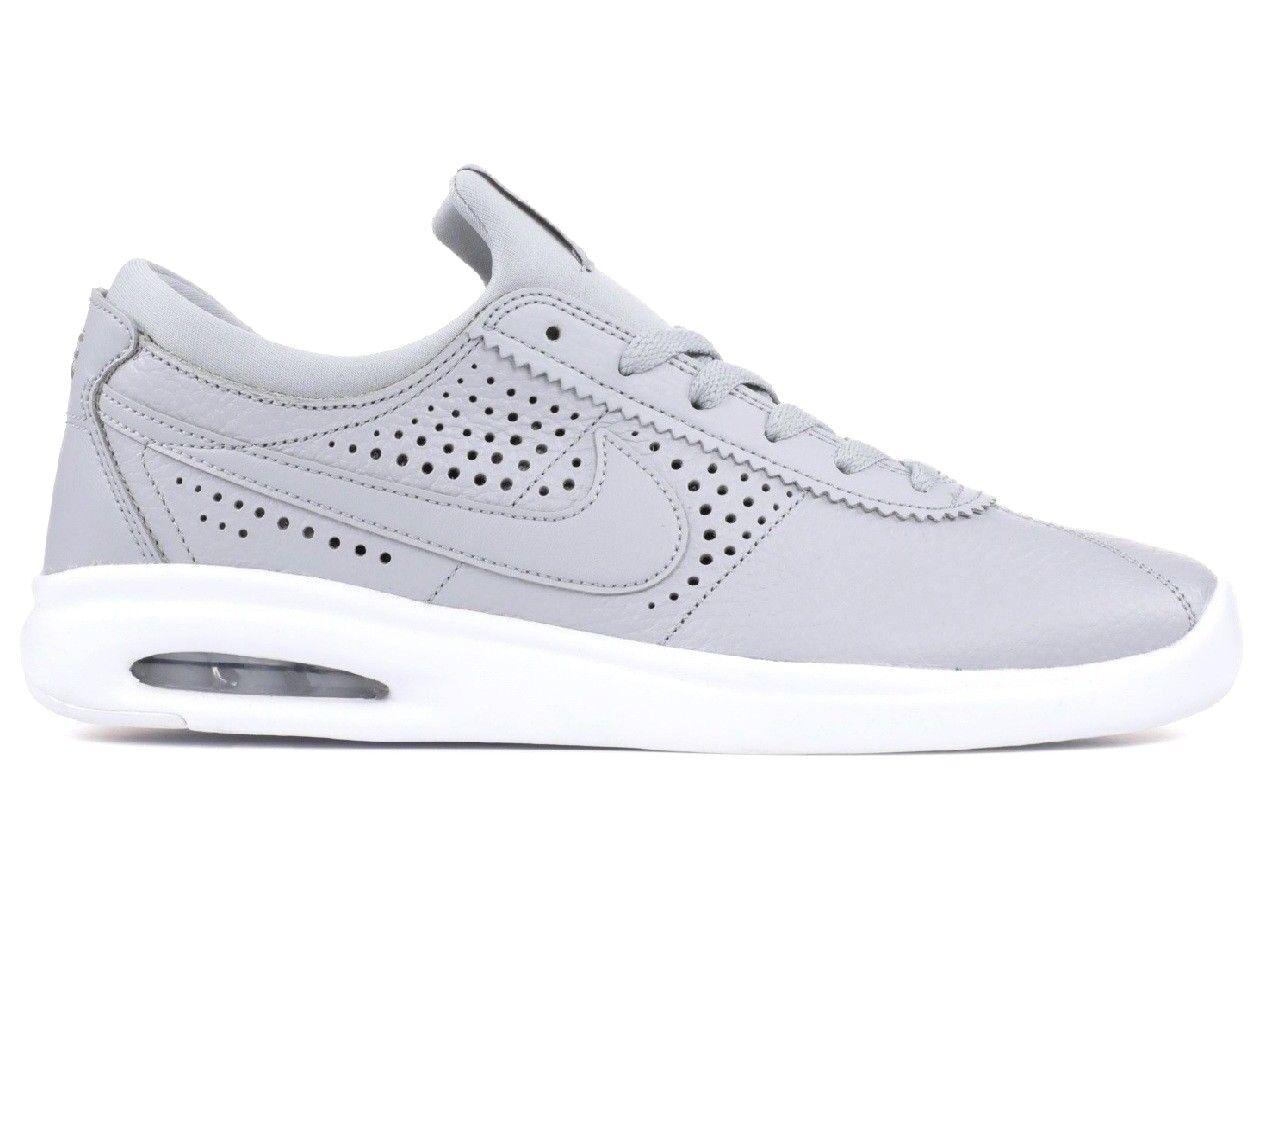 Nike SB Air Max Bruin Vapor Wolf Grey Men's Size 9.5 Skateboard 923111 006